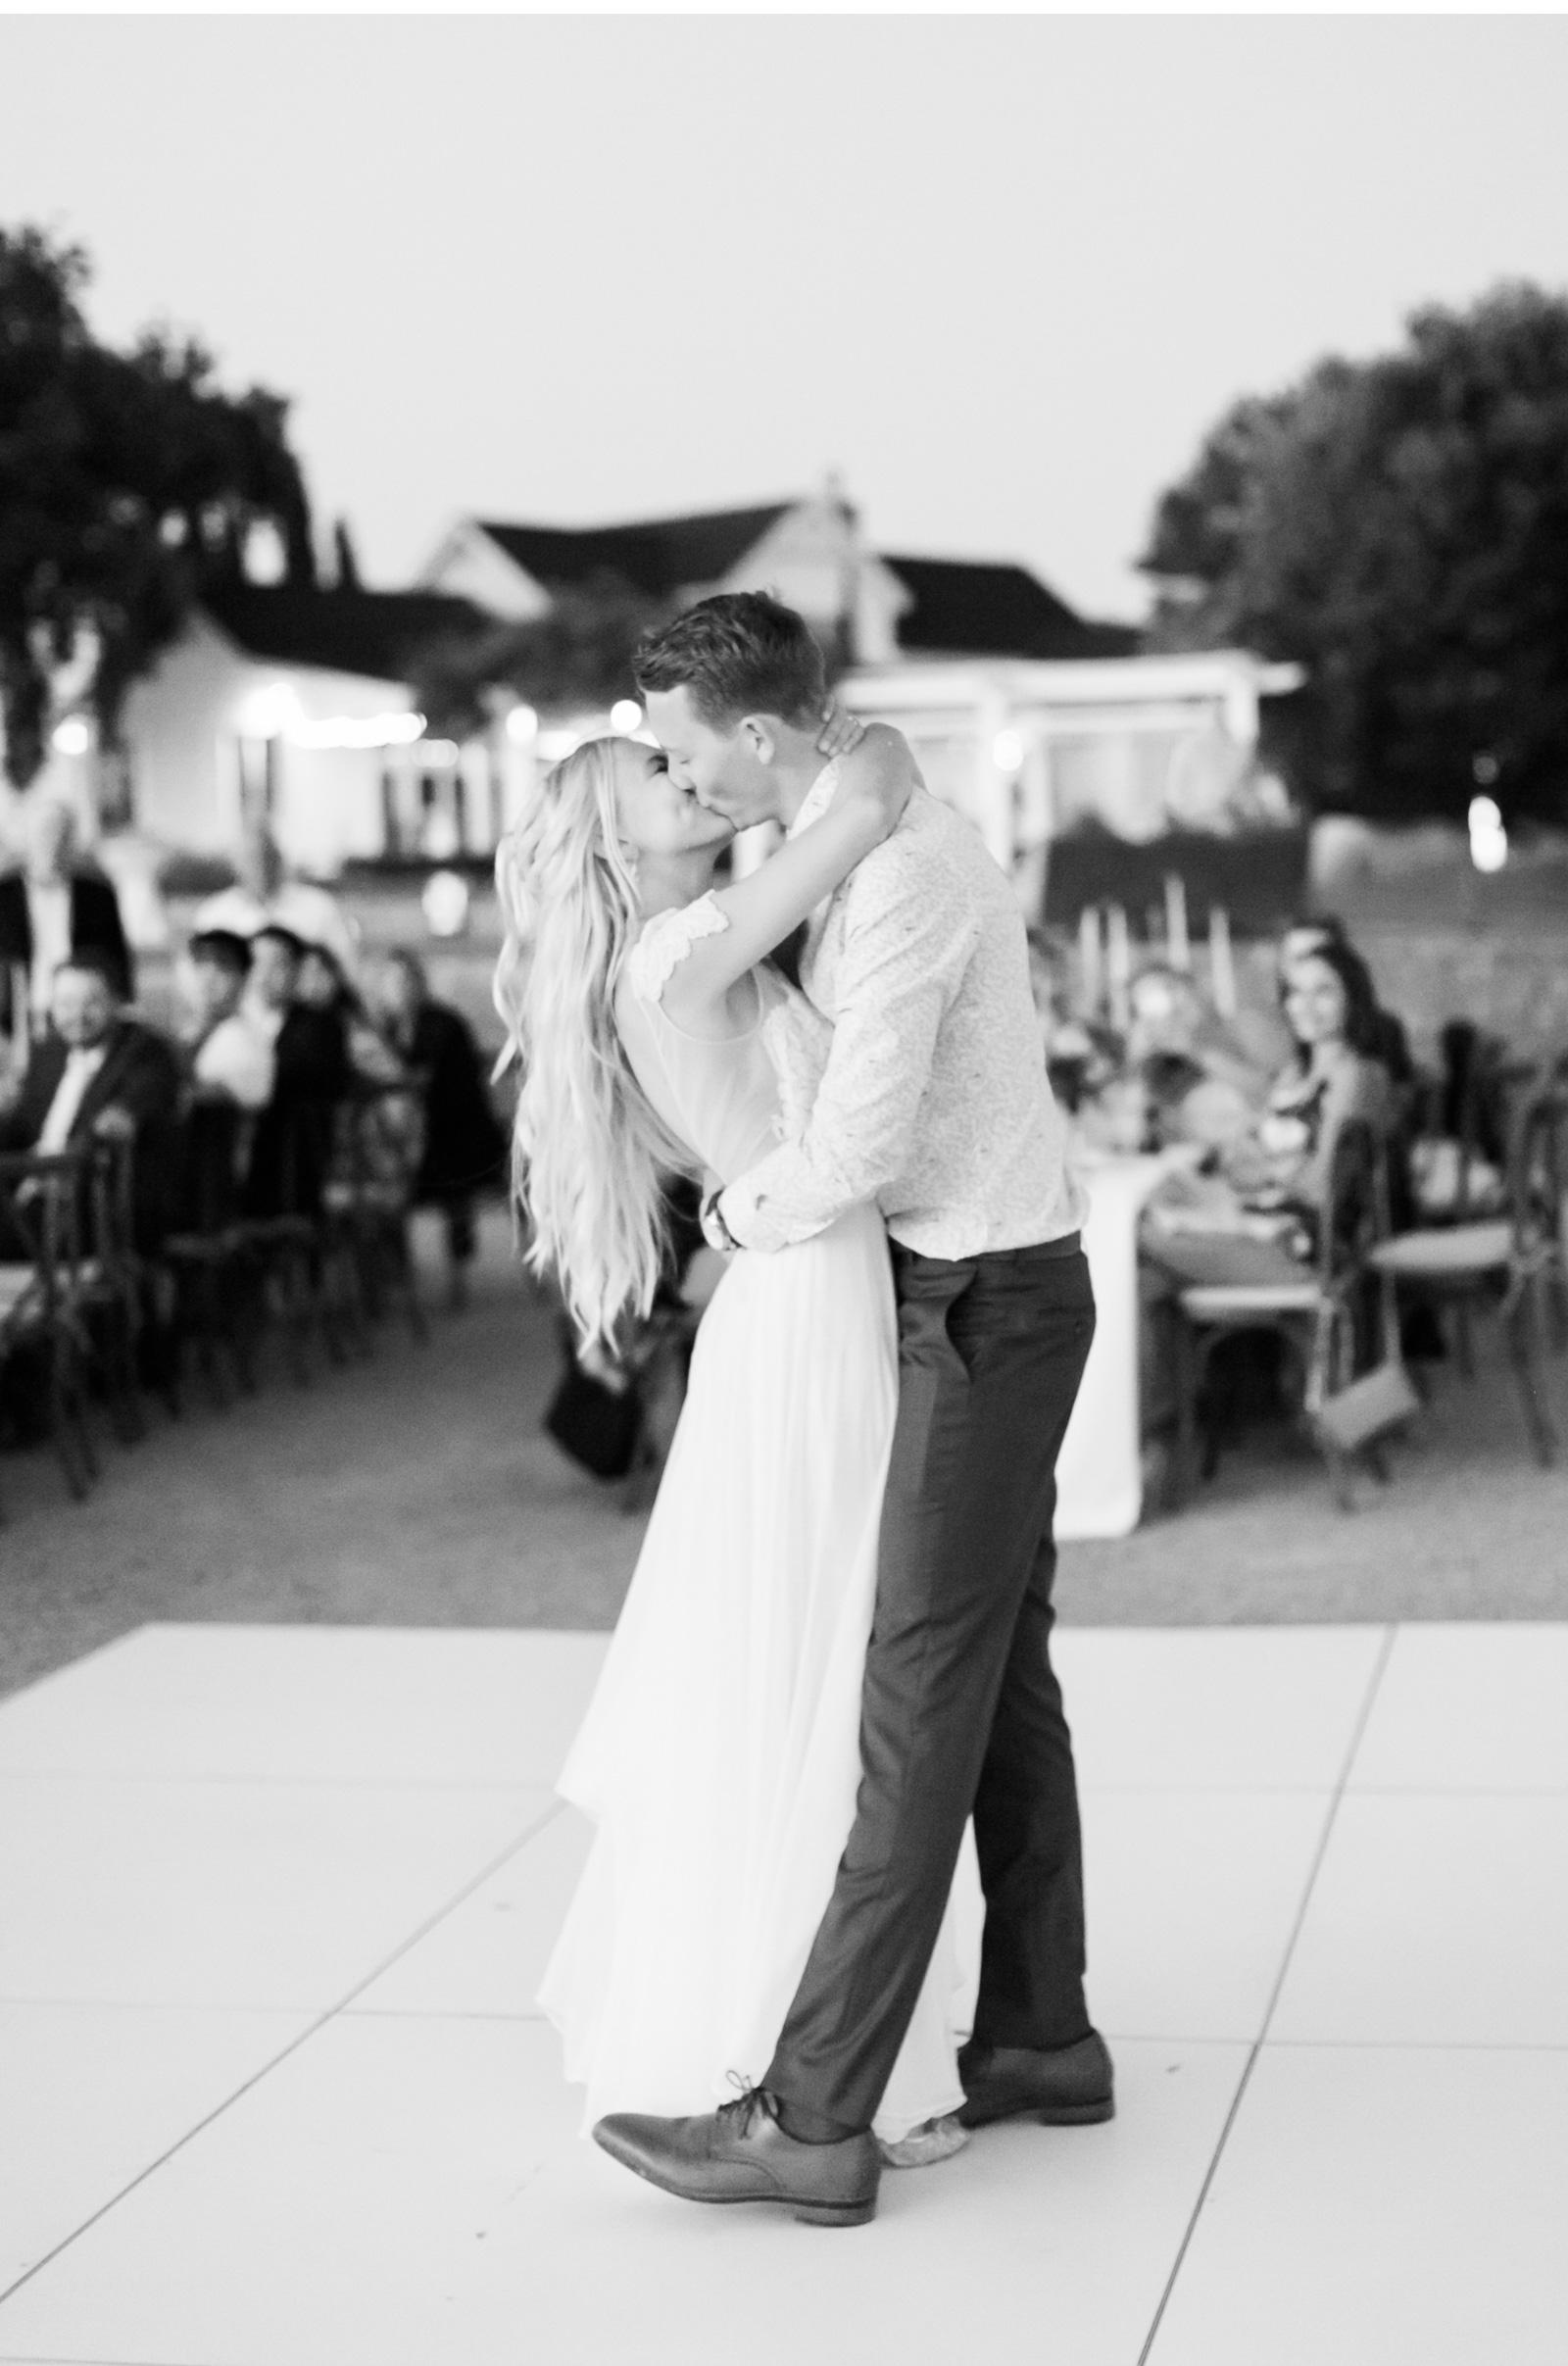 Style-Me-Pretty-California-Wedding-San-Luis-Obispo-Paso-Robles-Natalie-Schutt-Photography_06.jpg